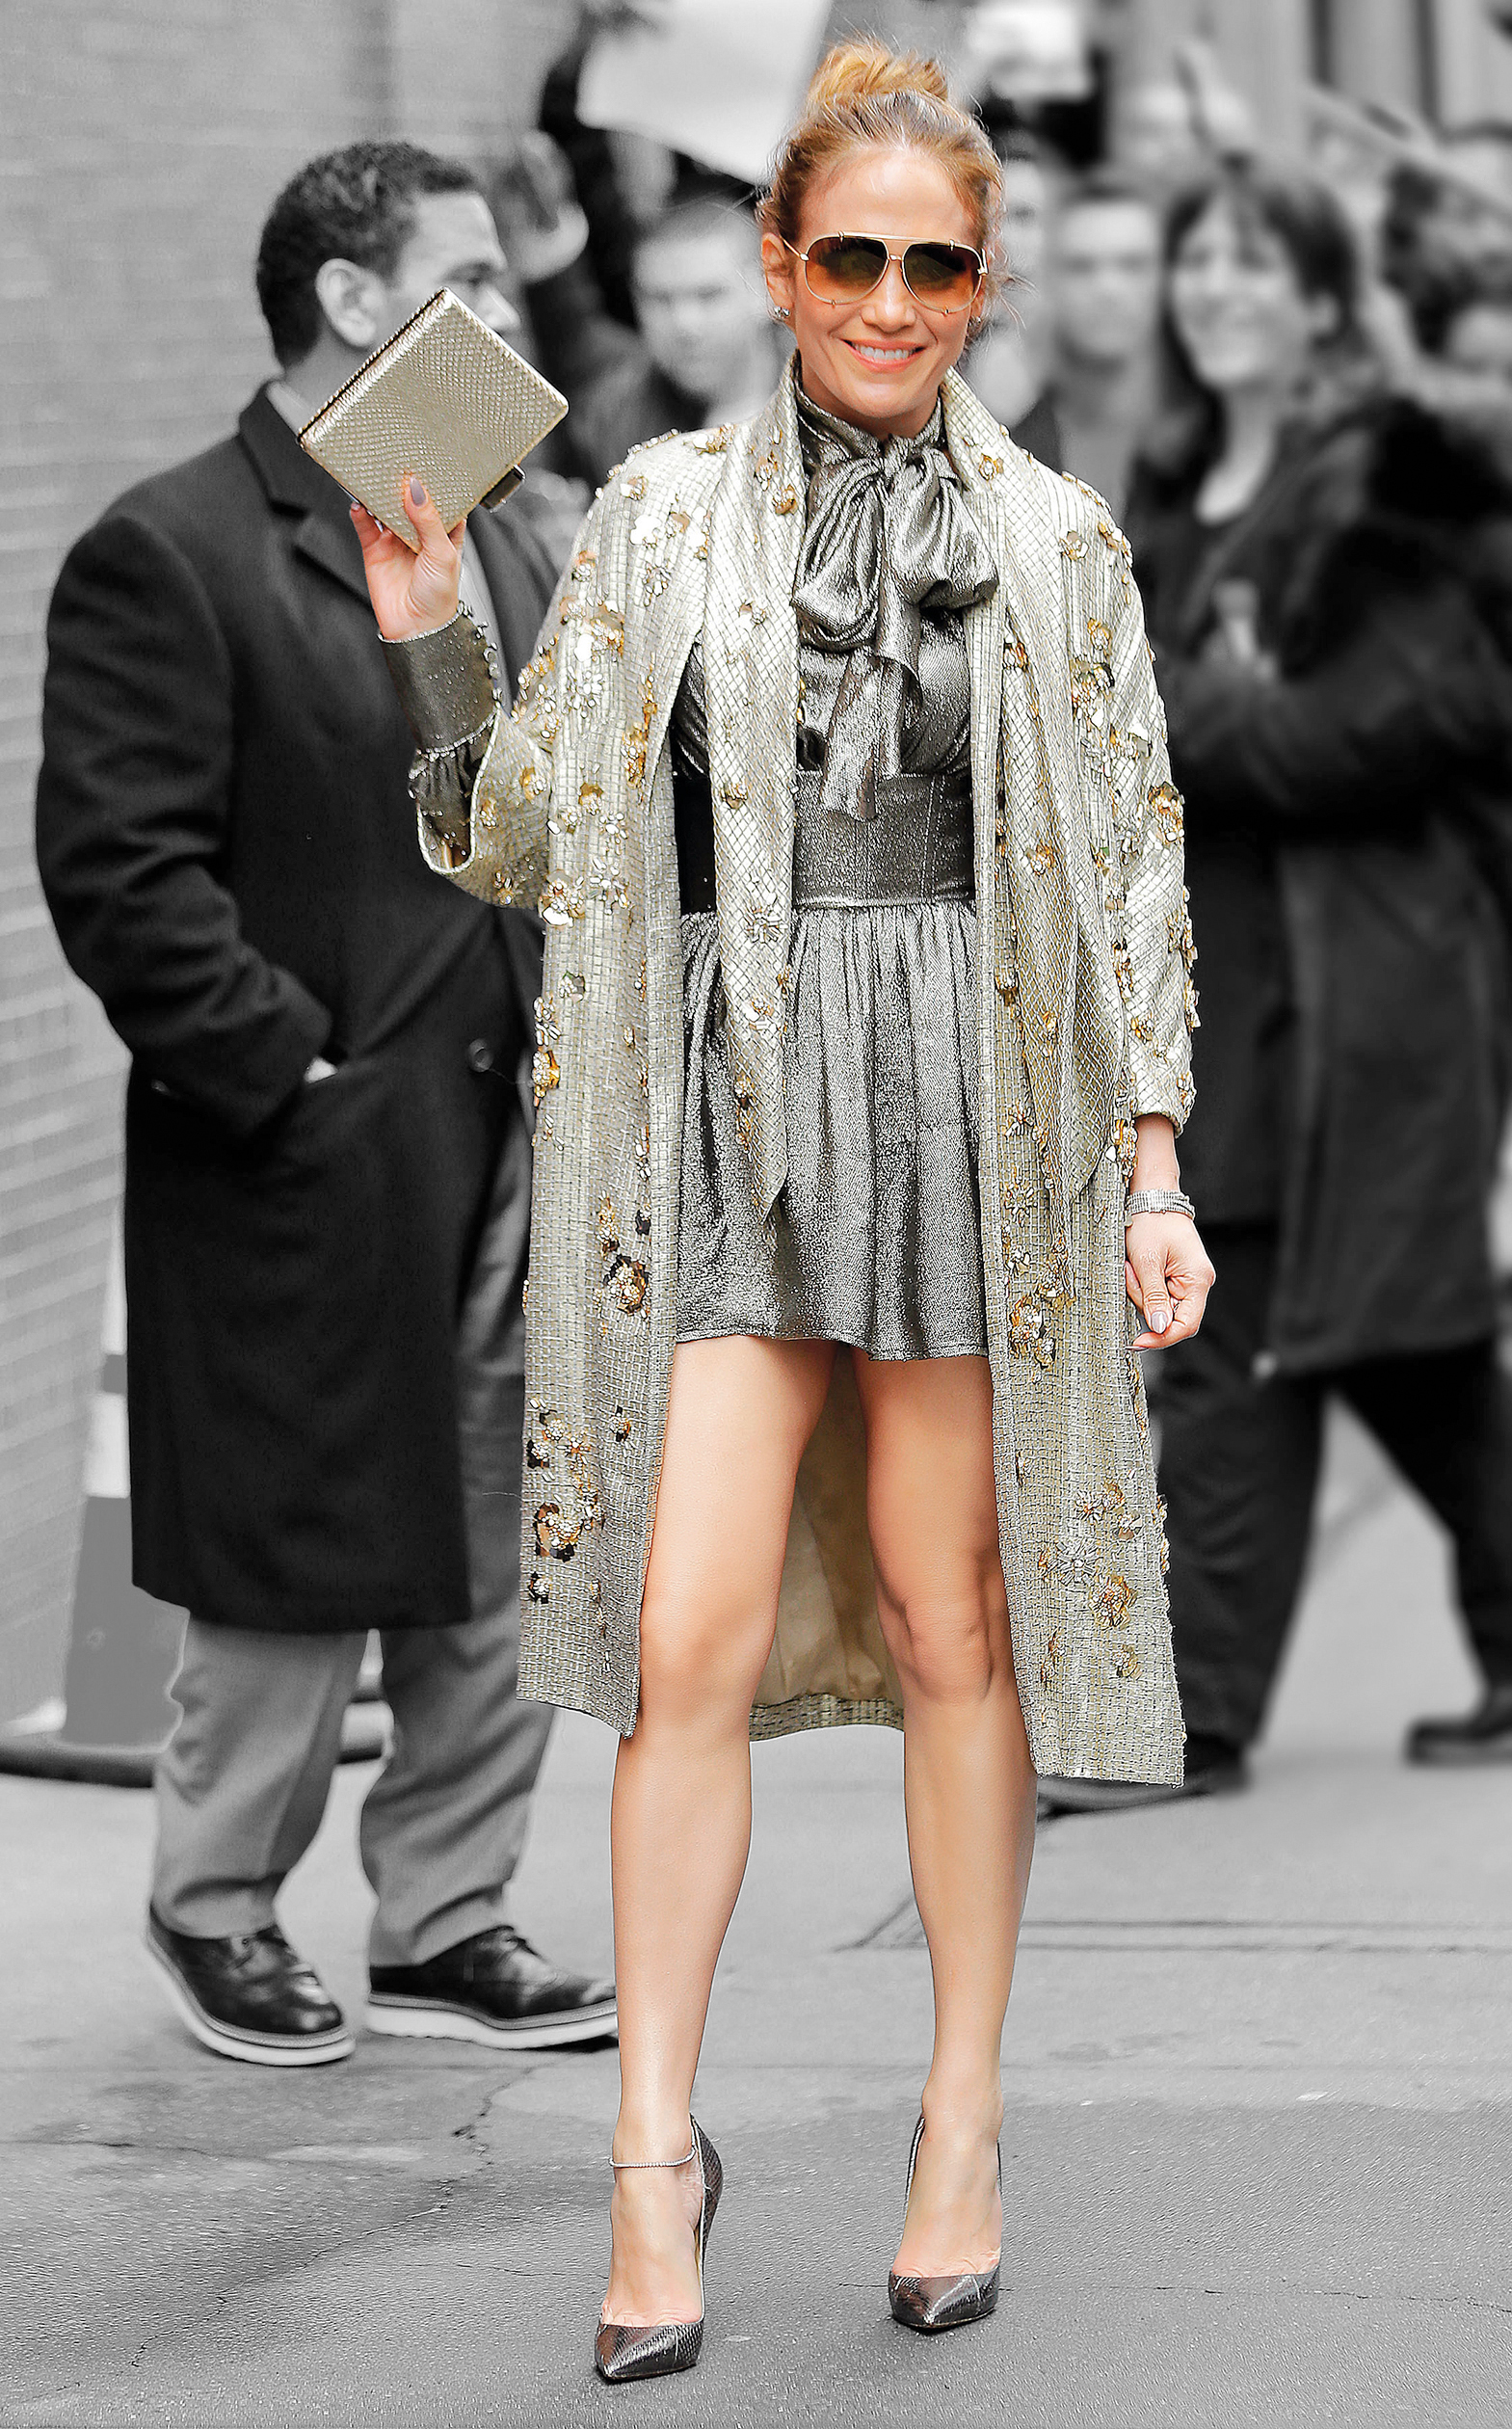 Bluza i suknja Saint Laurent, ogrtač Jenny Packham, salonke Jimmy Choo